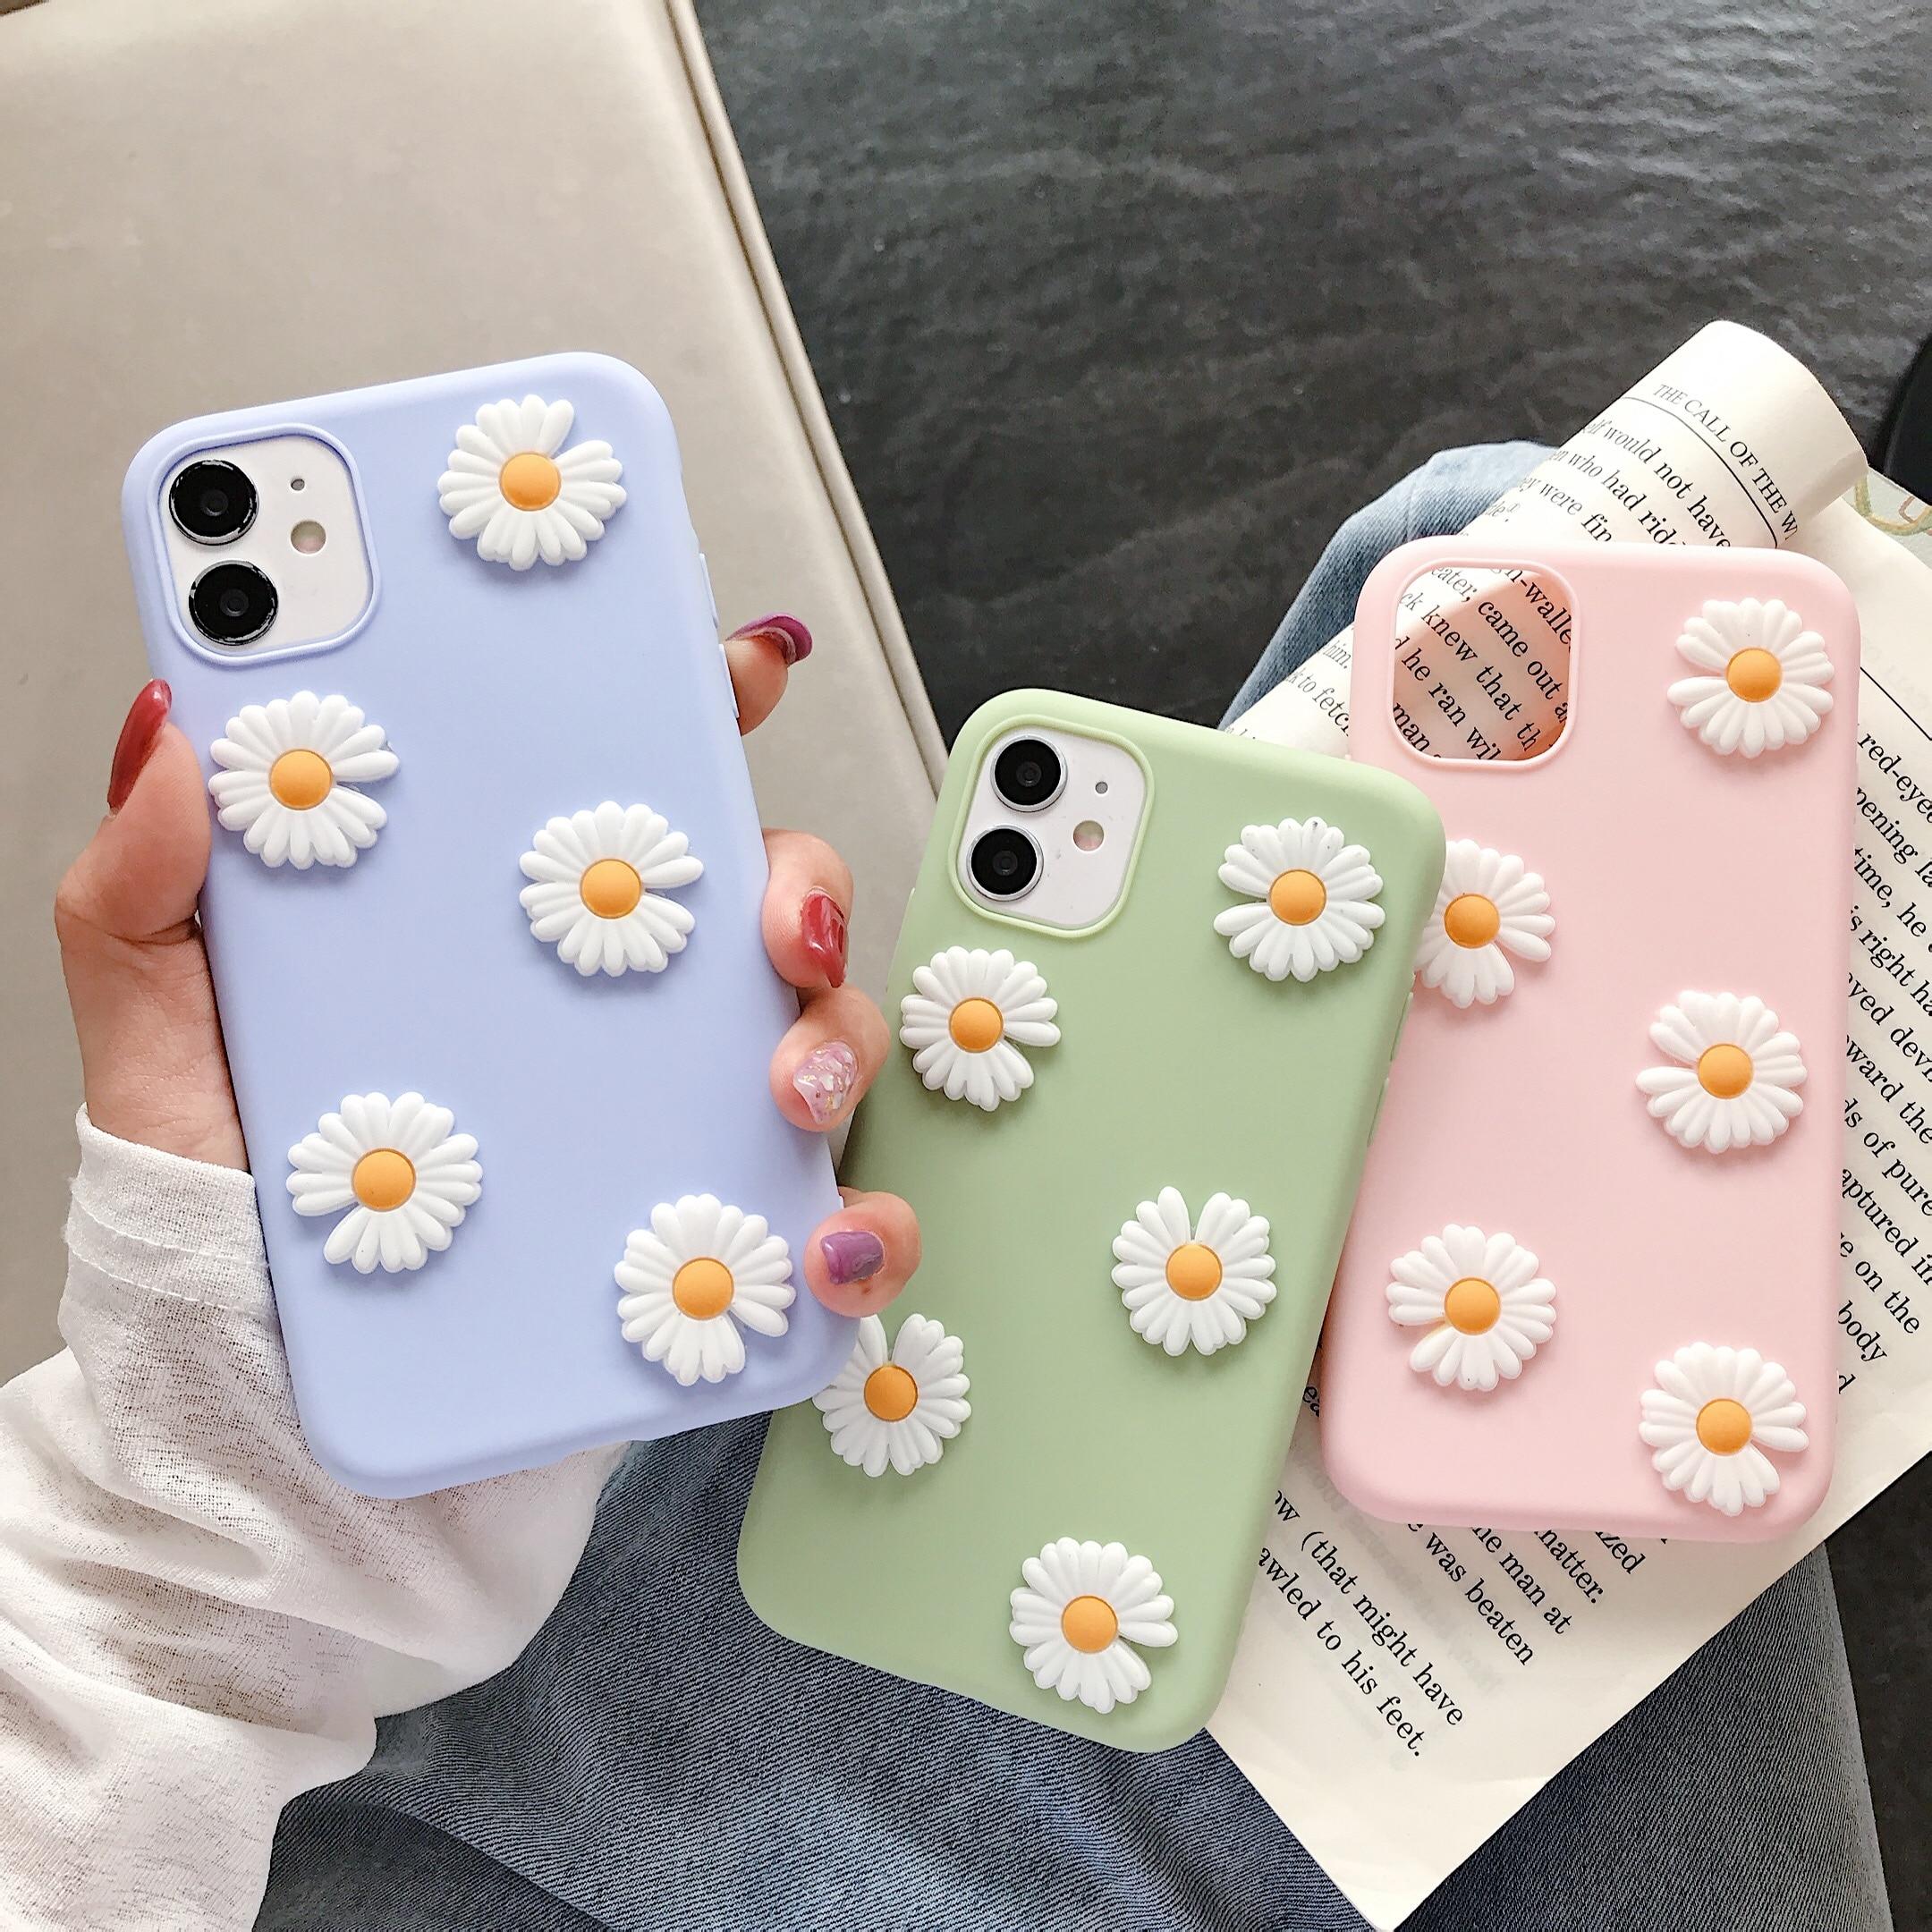 Ins lindo 3D Daisy de silicona suave funda de teléfono para Redmi S2 Y2 4A 4X 5 5Plus 5A 6 6A 6Pro 7 7A 8 8A F1 ir K20 K30 Pro K20Pro K30Pro